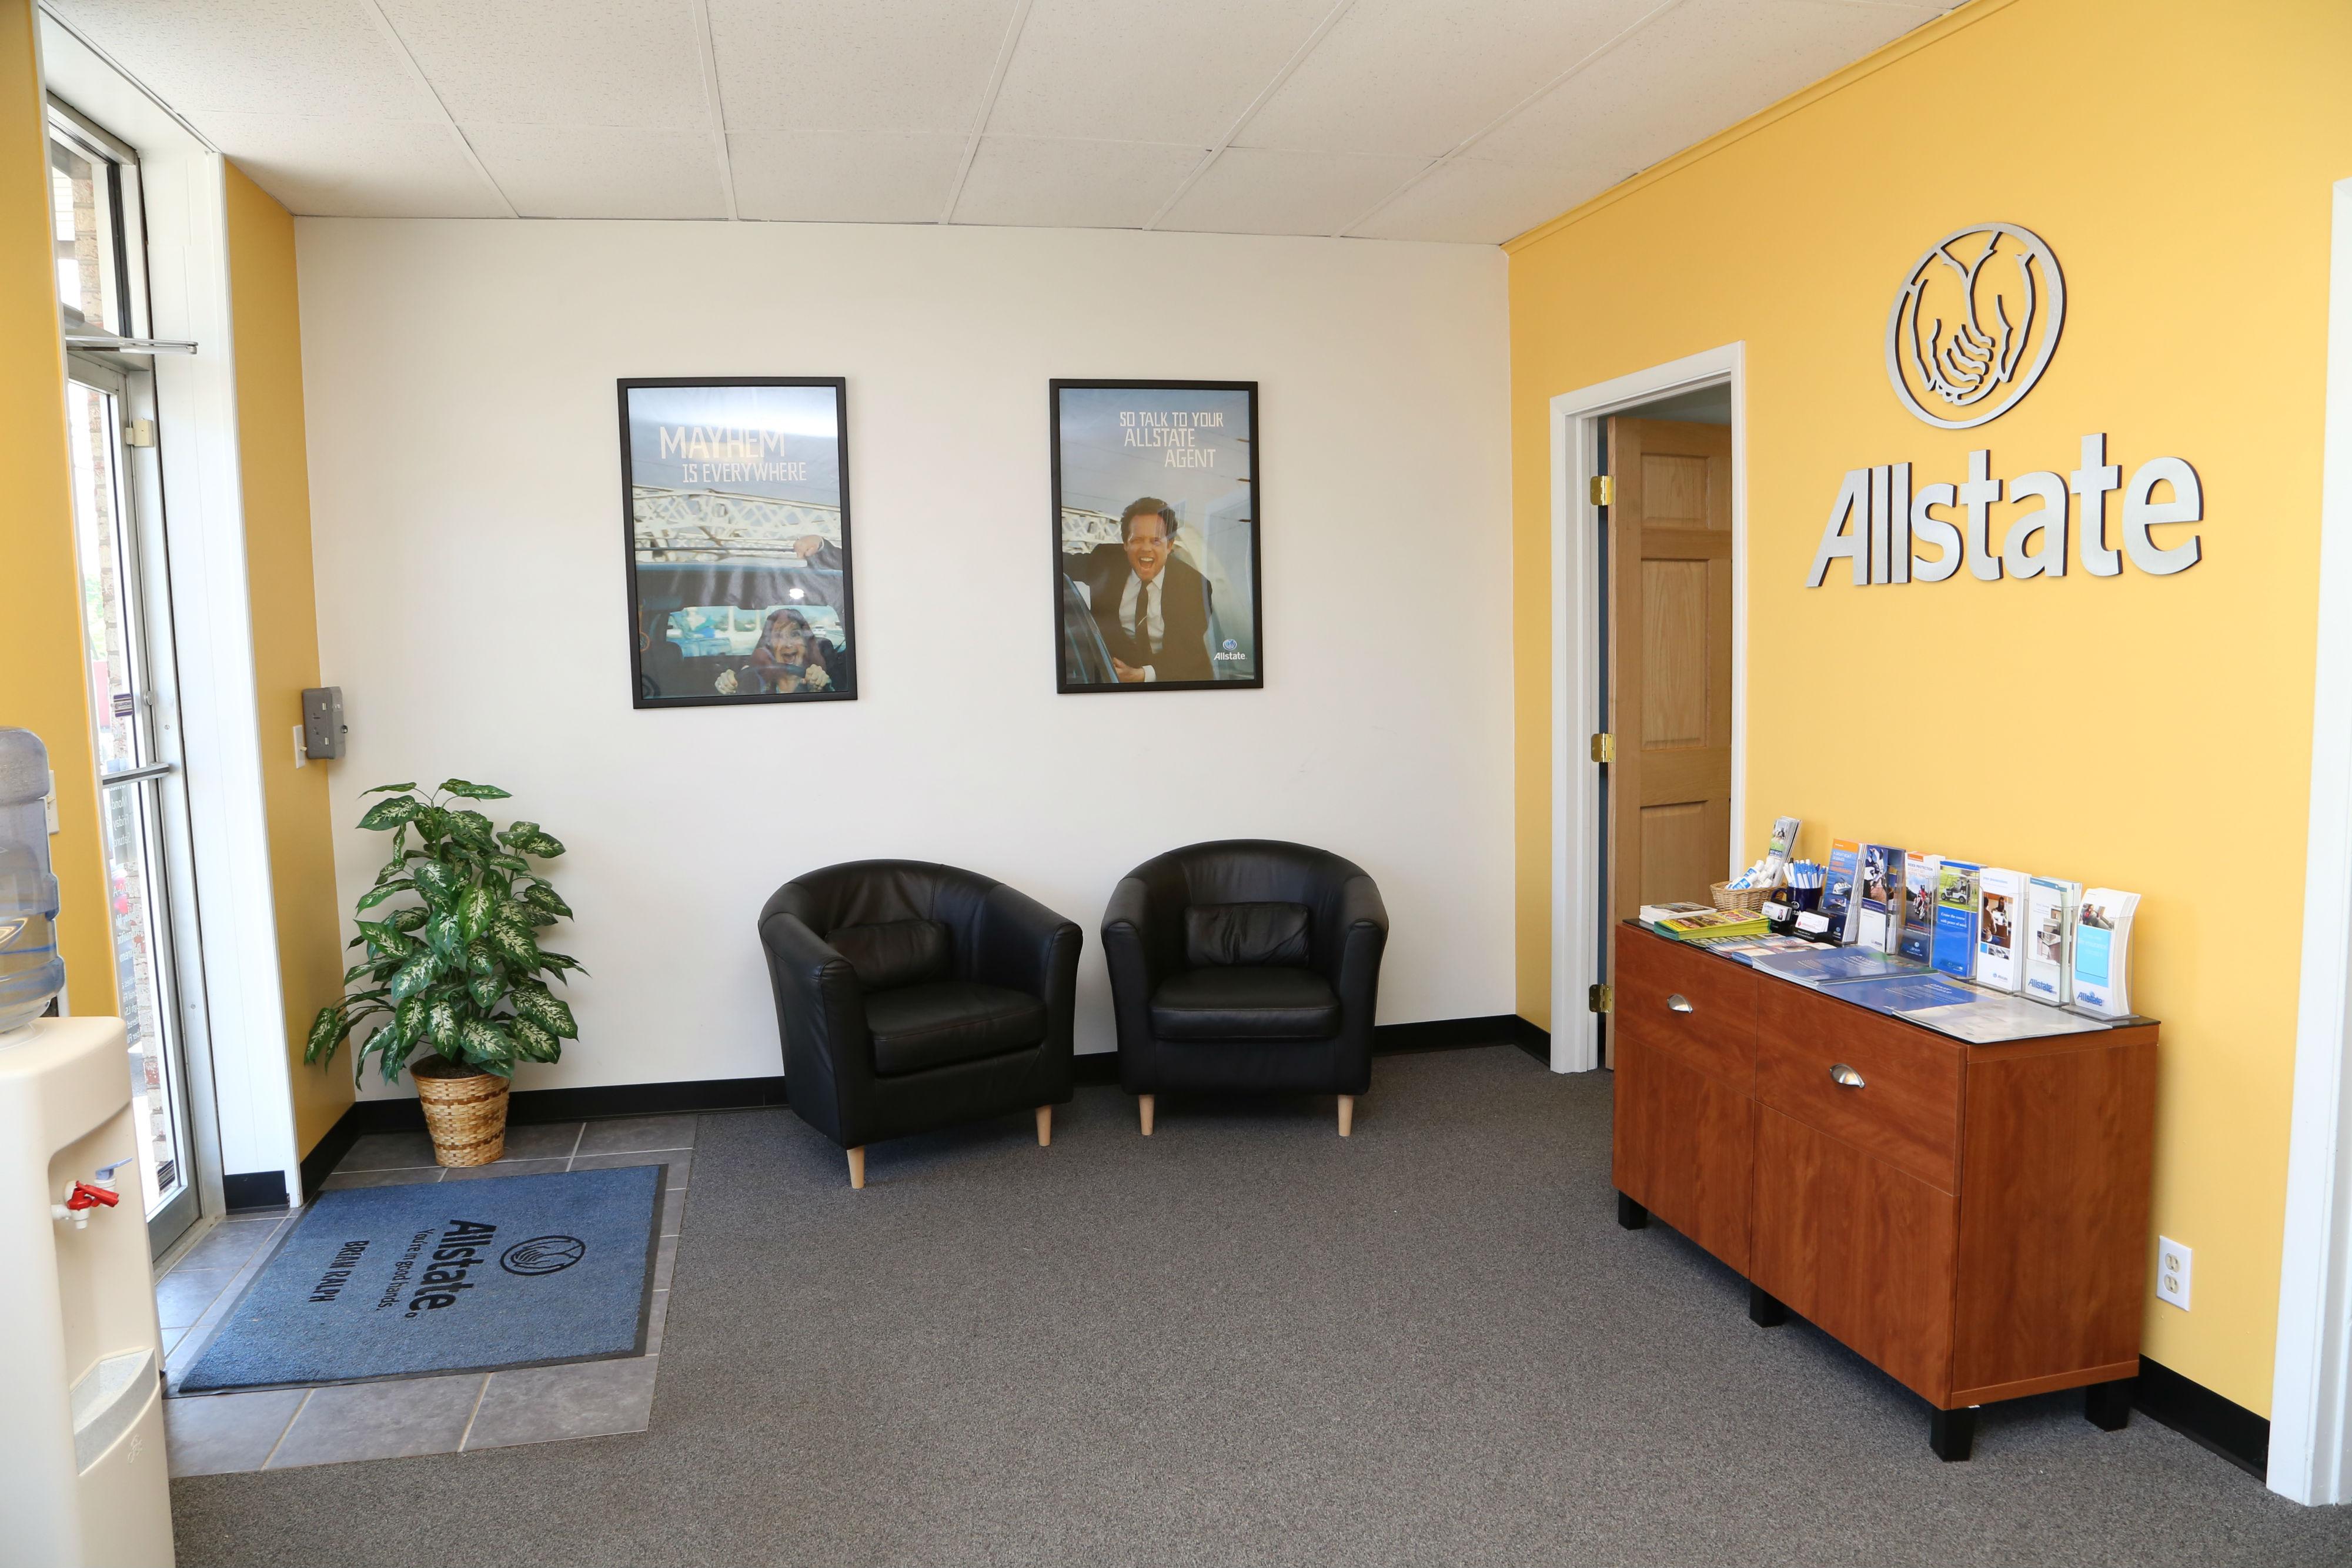 Allstate Insurance Agent: Brian Ralph image 1